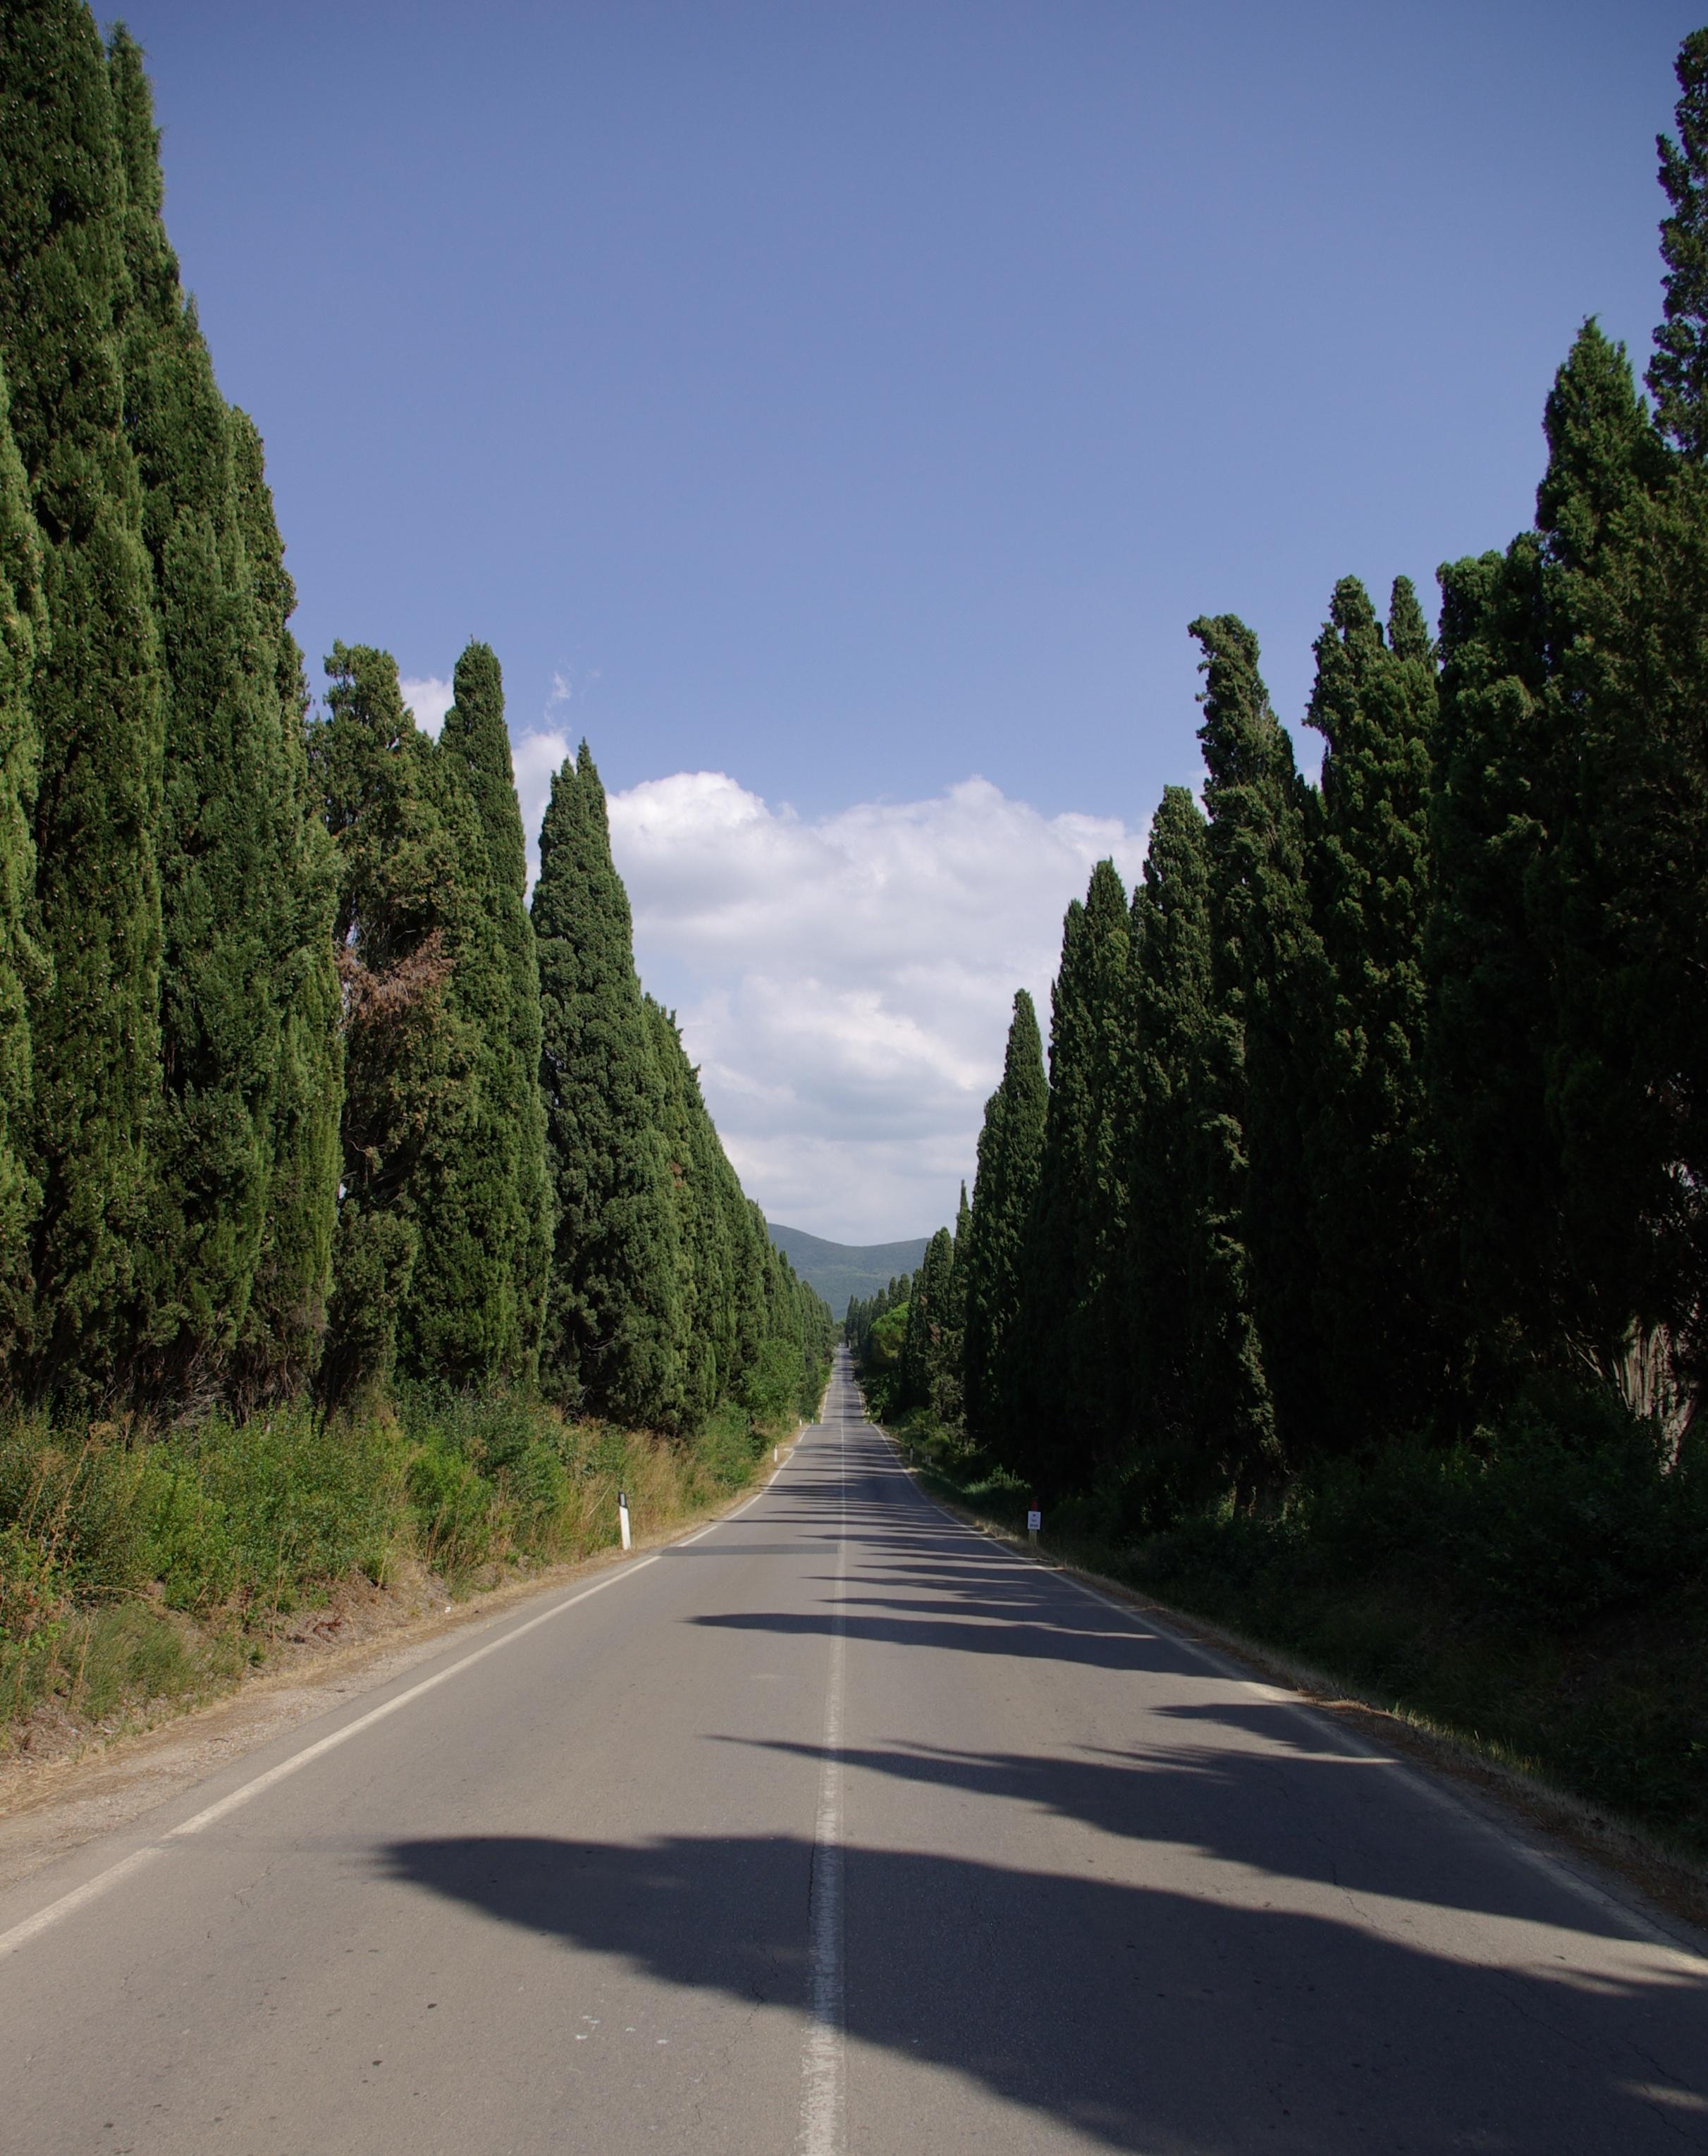 Bolgheri Viale dei Cipressi 001.JPG